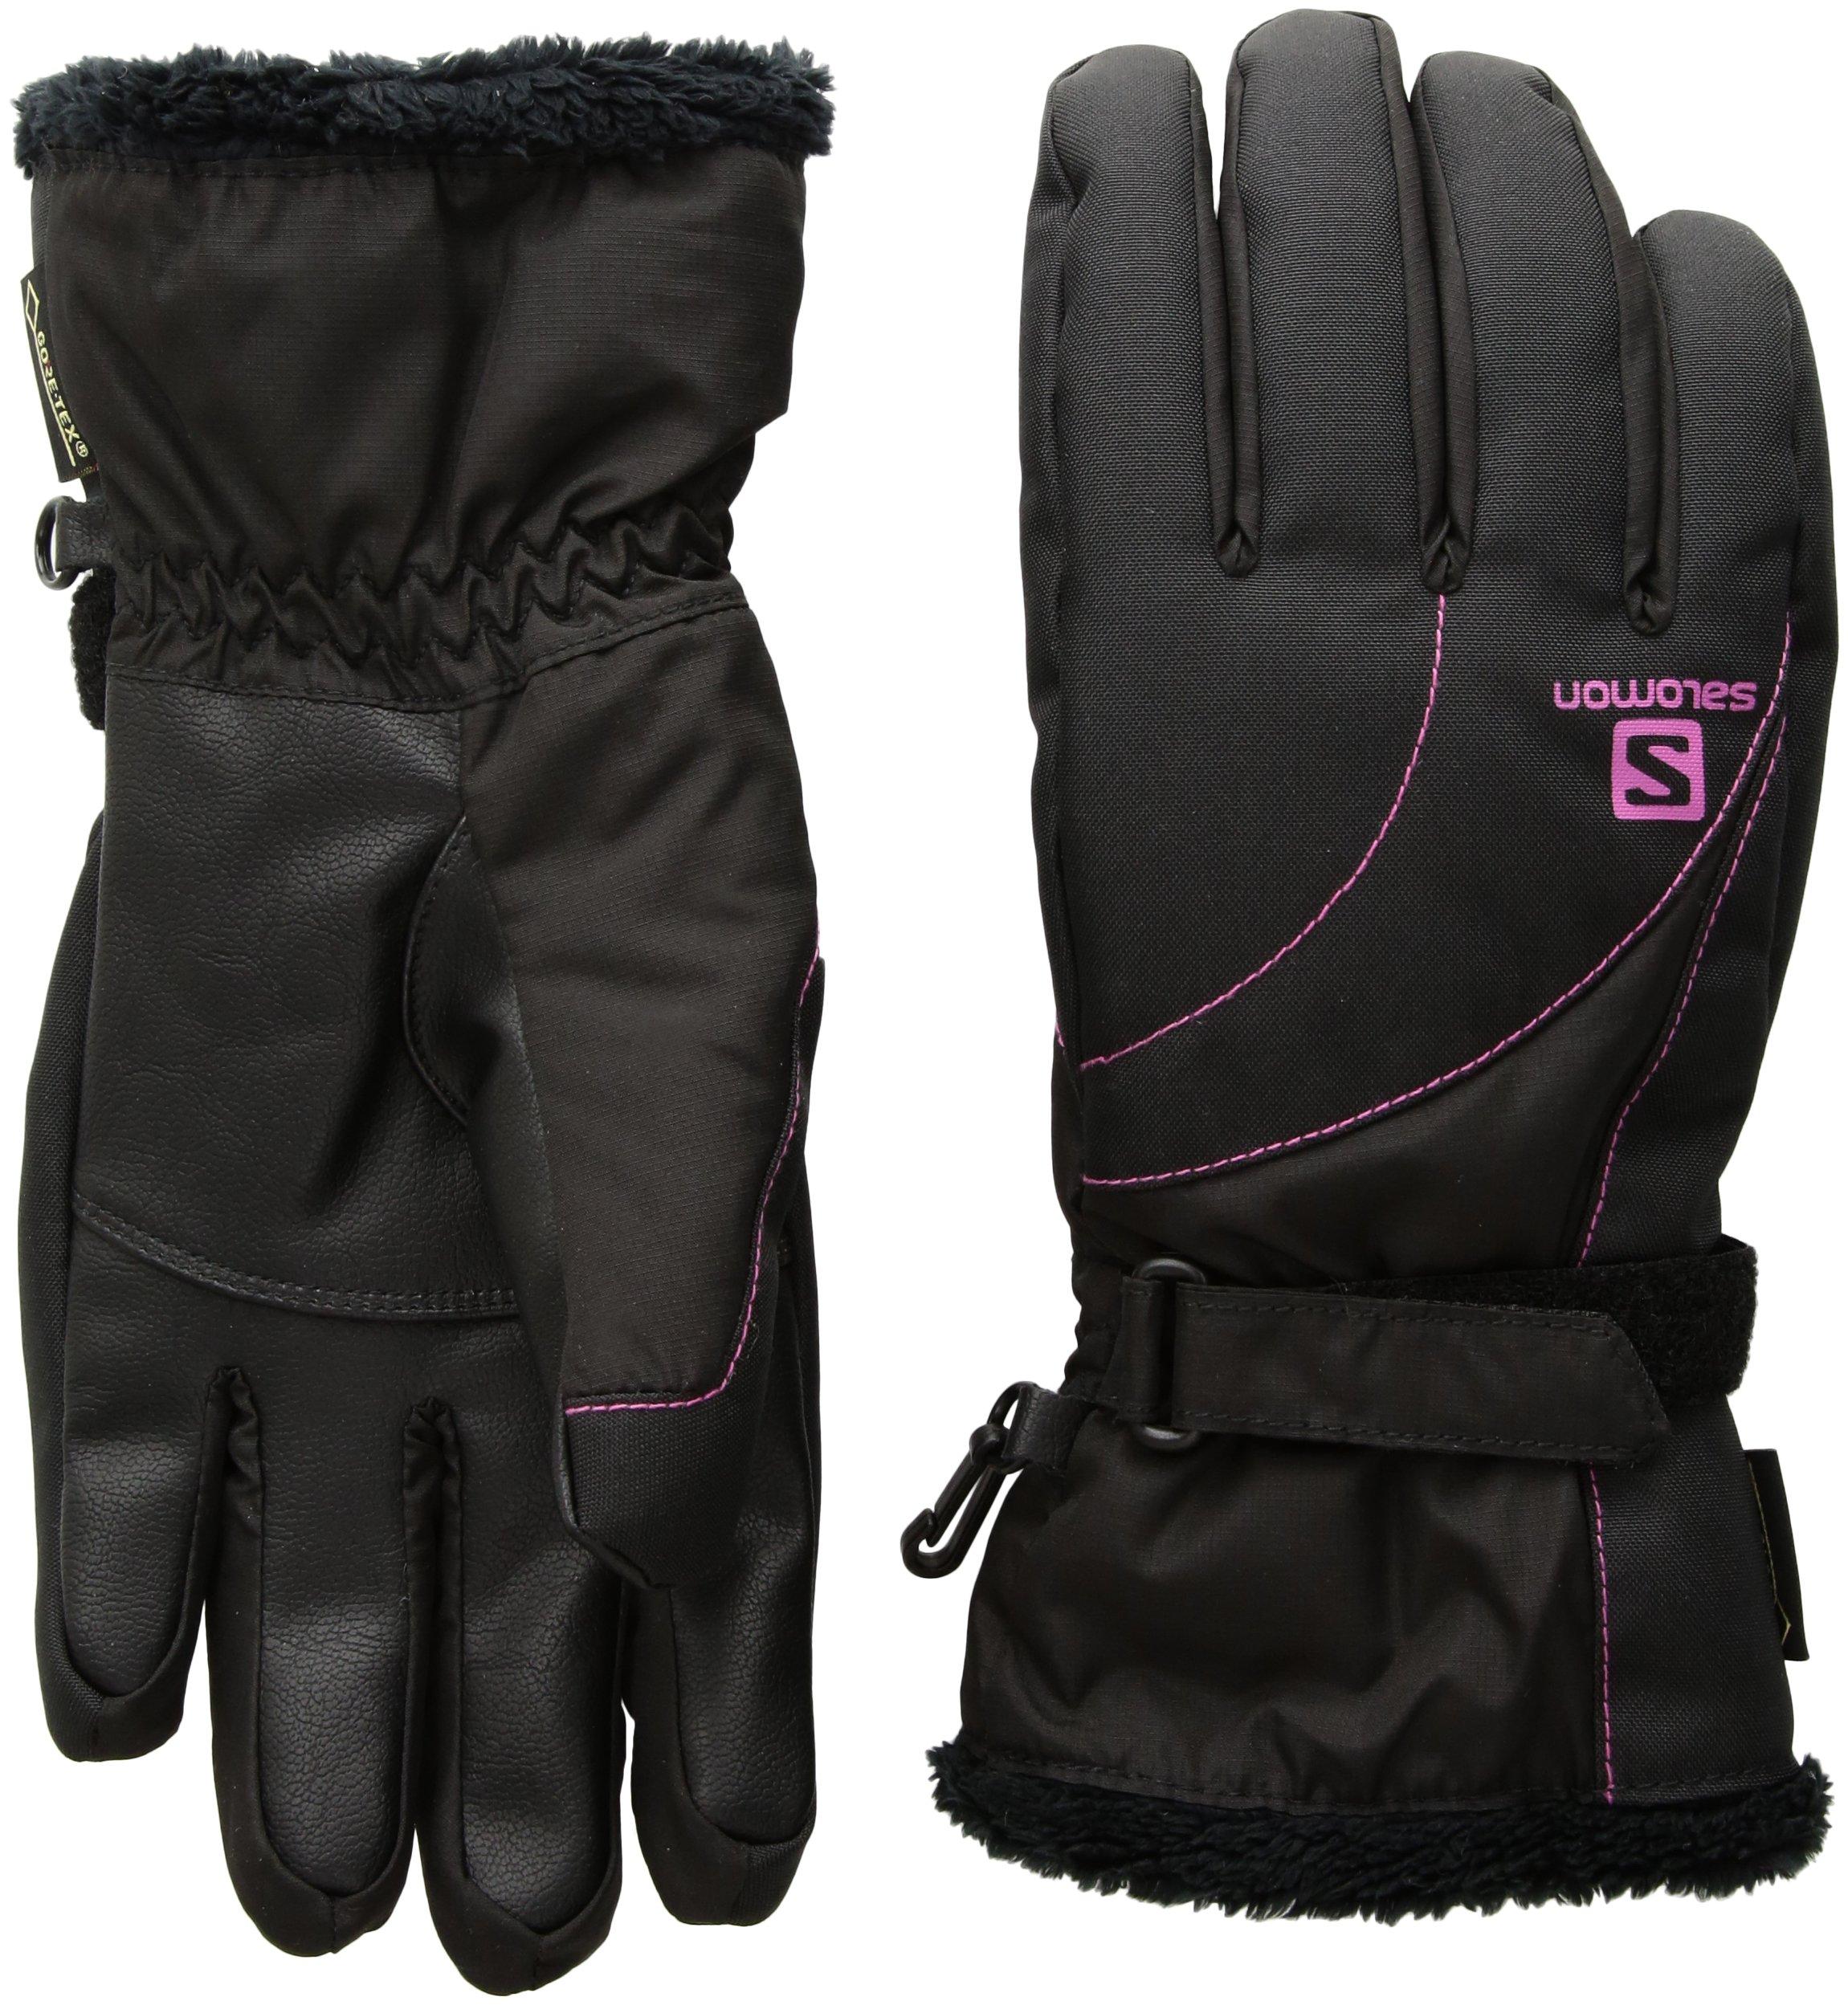 Salomon Women's Force GTX Gloves, Black/Rose Violet, Large